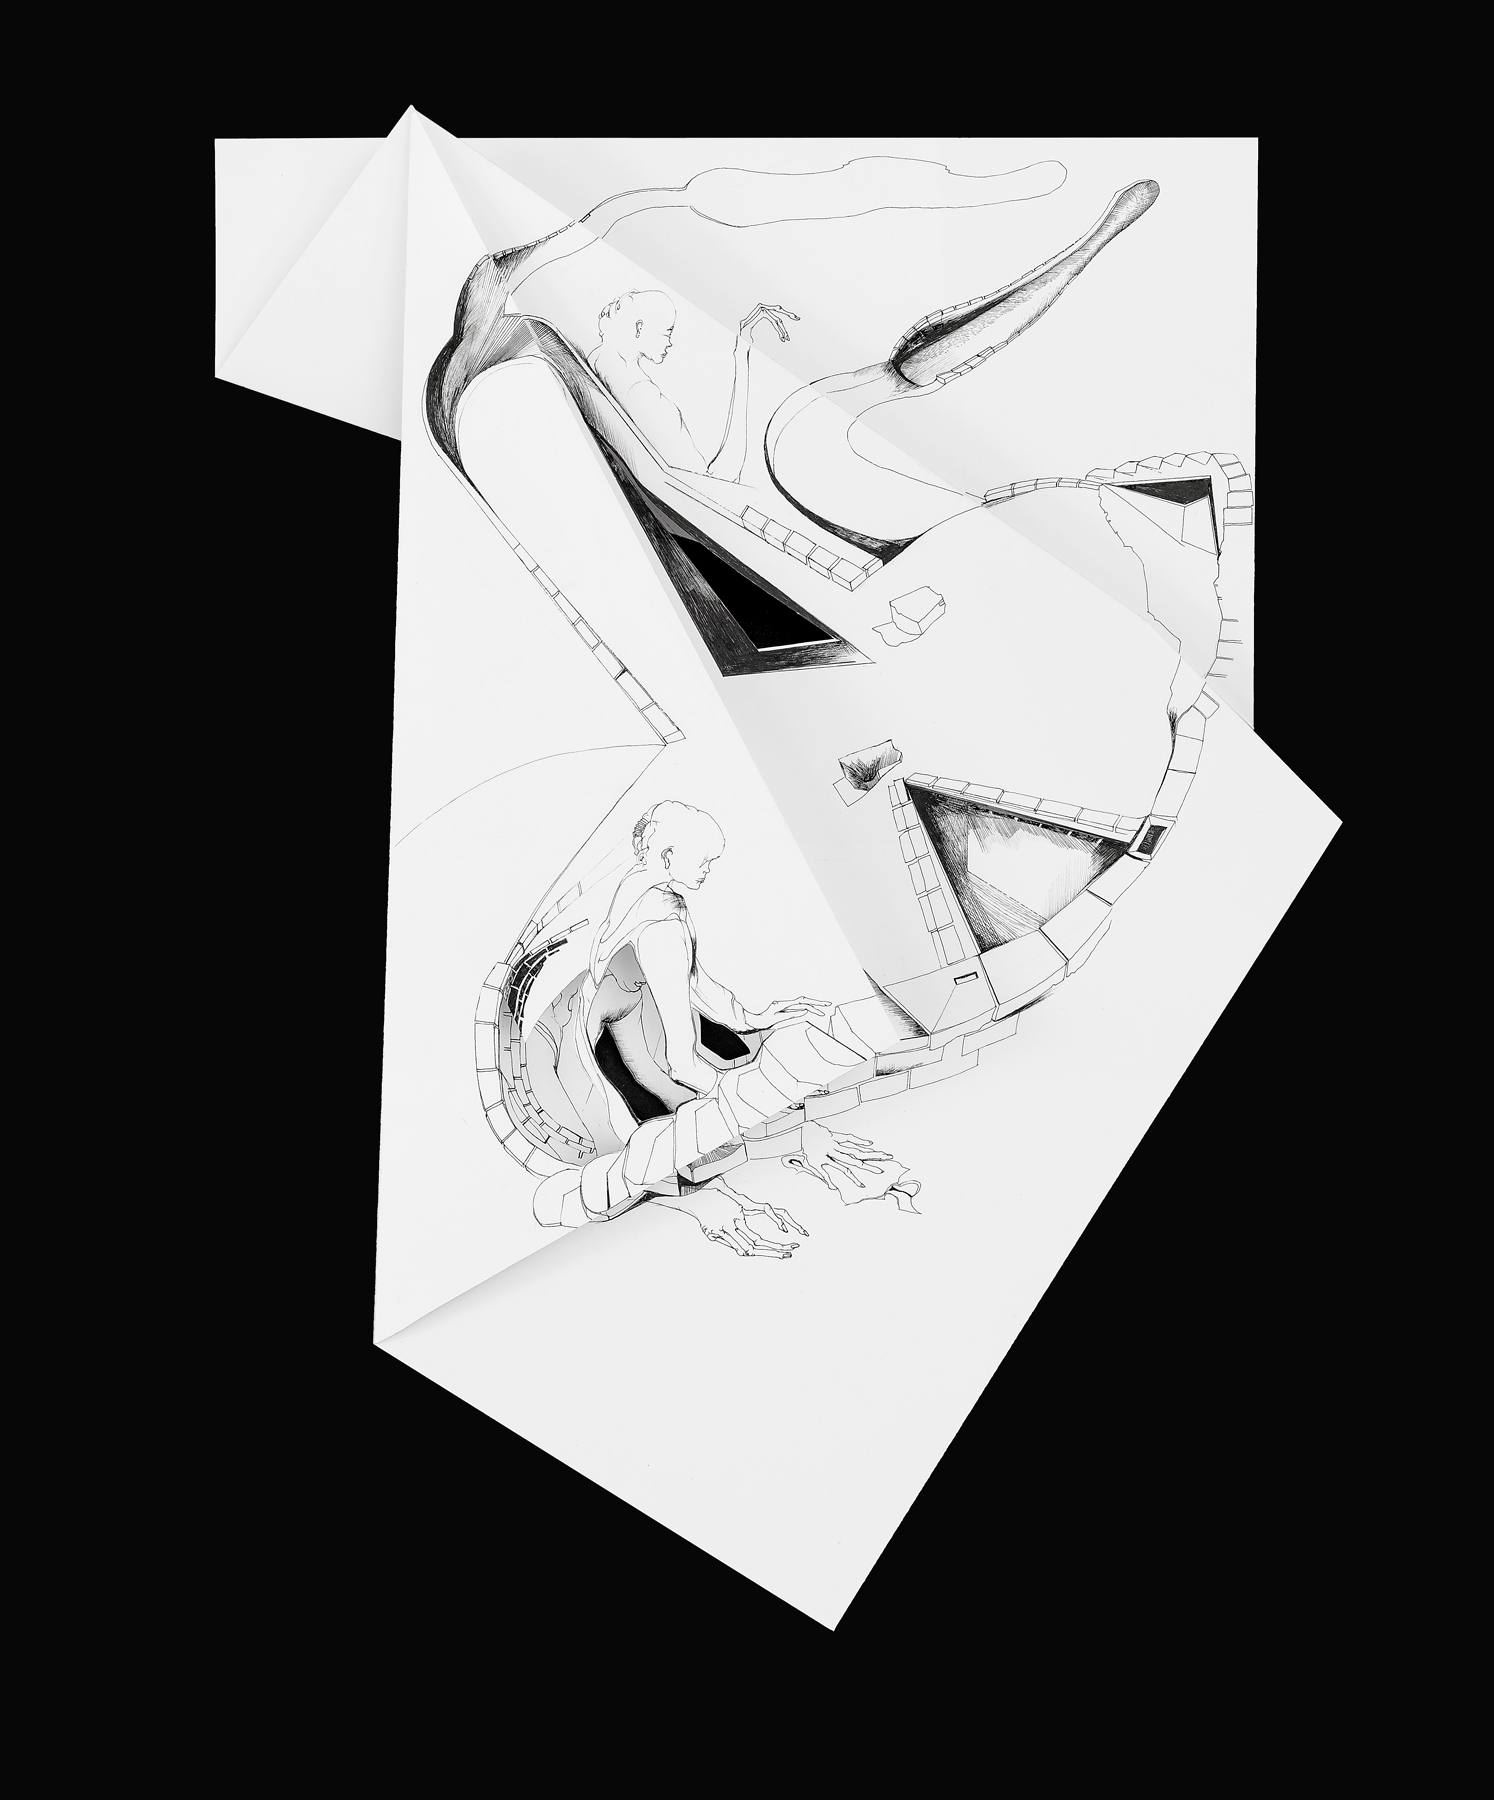 Nina Annabelle Märkl   Fragmented Fiction VIII   Ink on folded paper, Cut - Outs   46 x 38 cm   2016